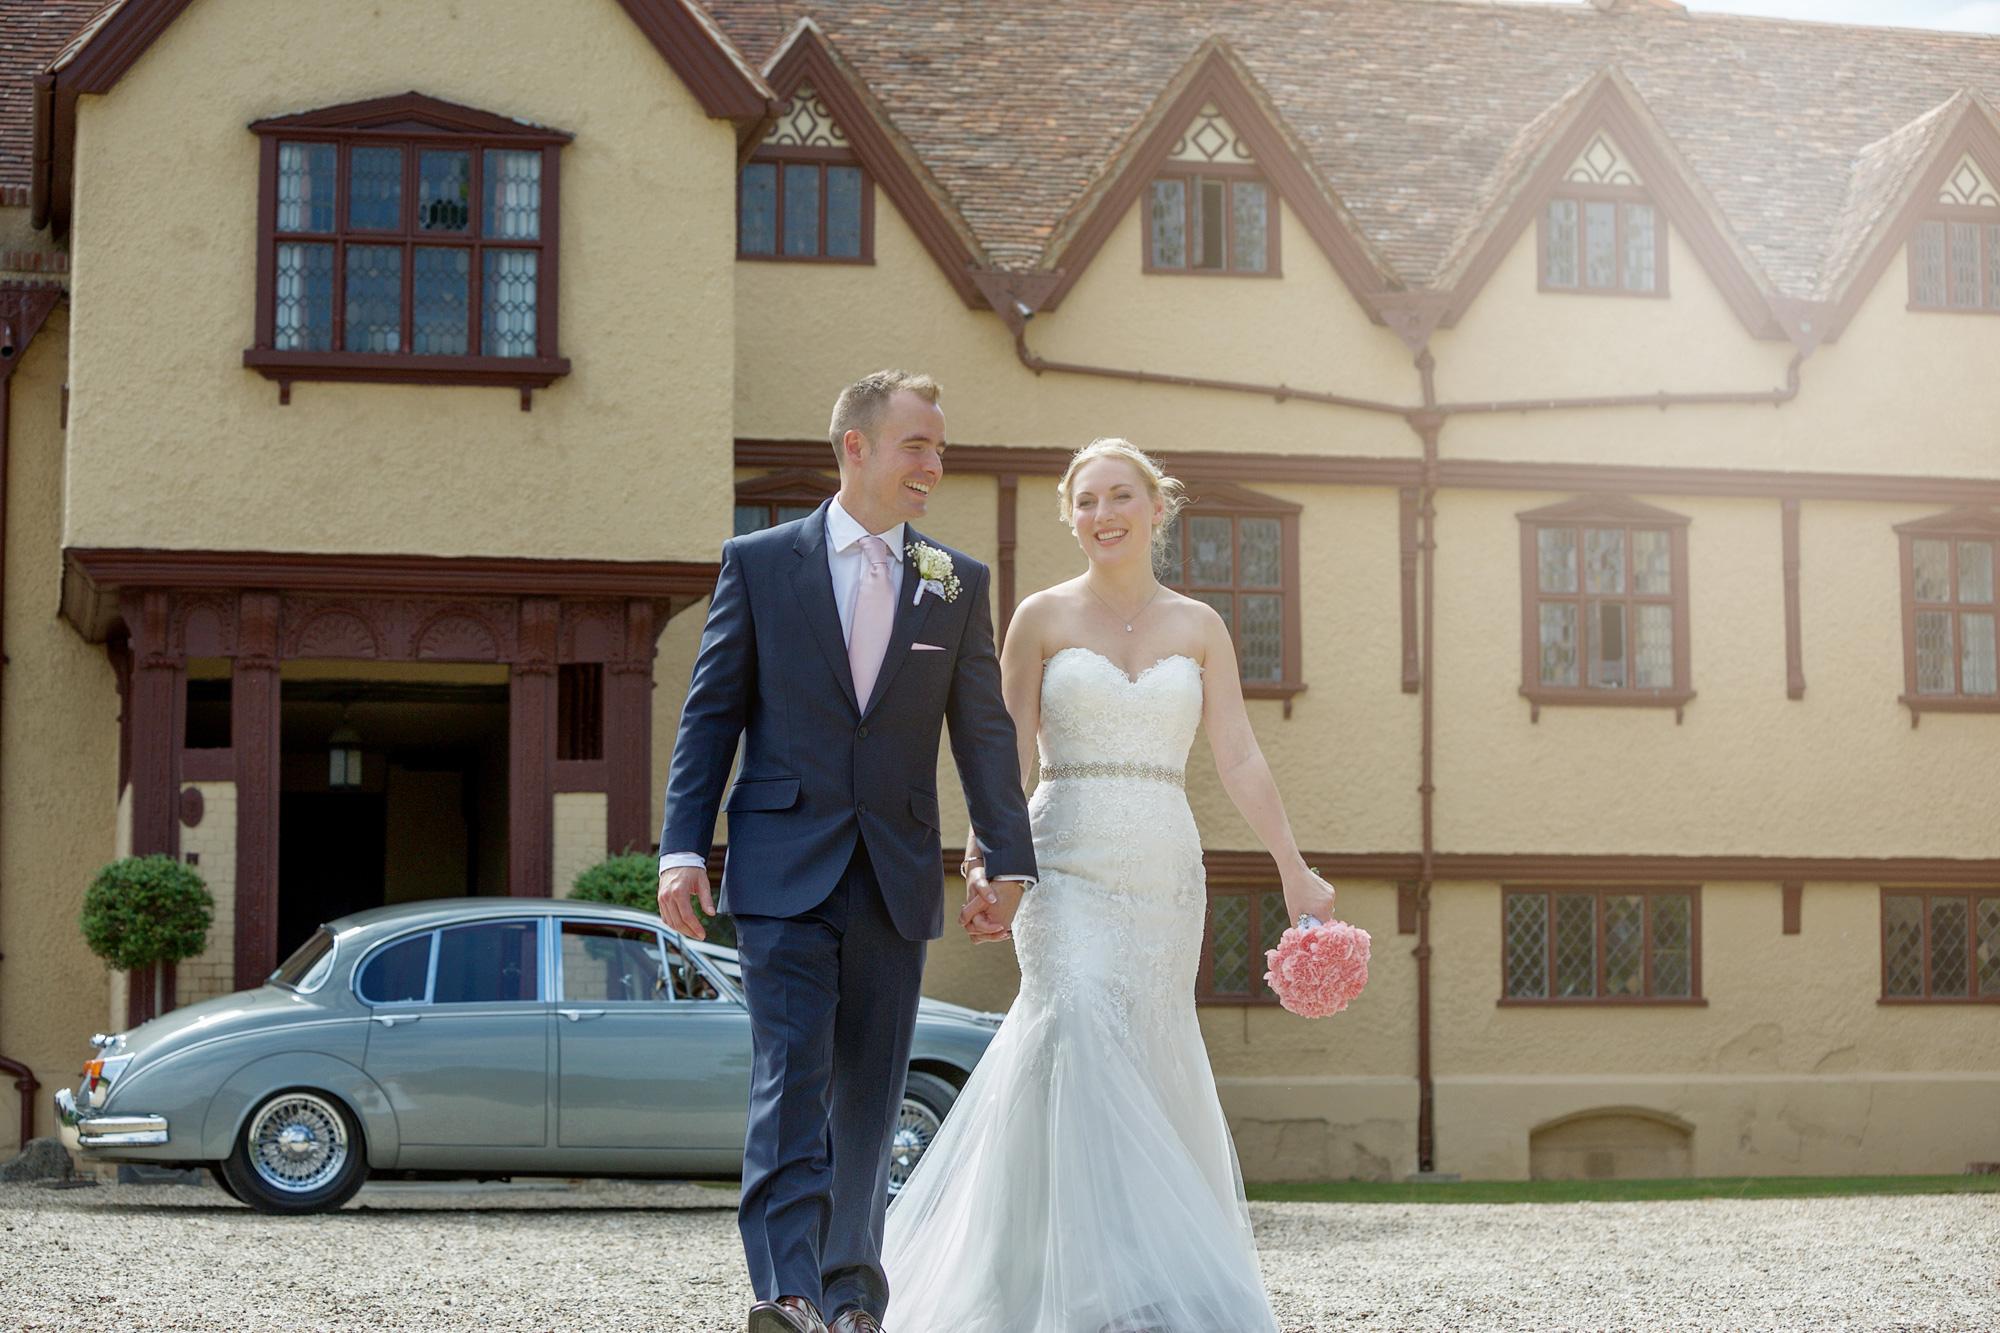 Adam_Hillier_Wedding_Photographer_Newbury_Berkshire_9 (3).jpg